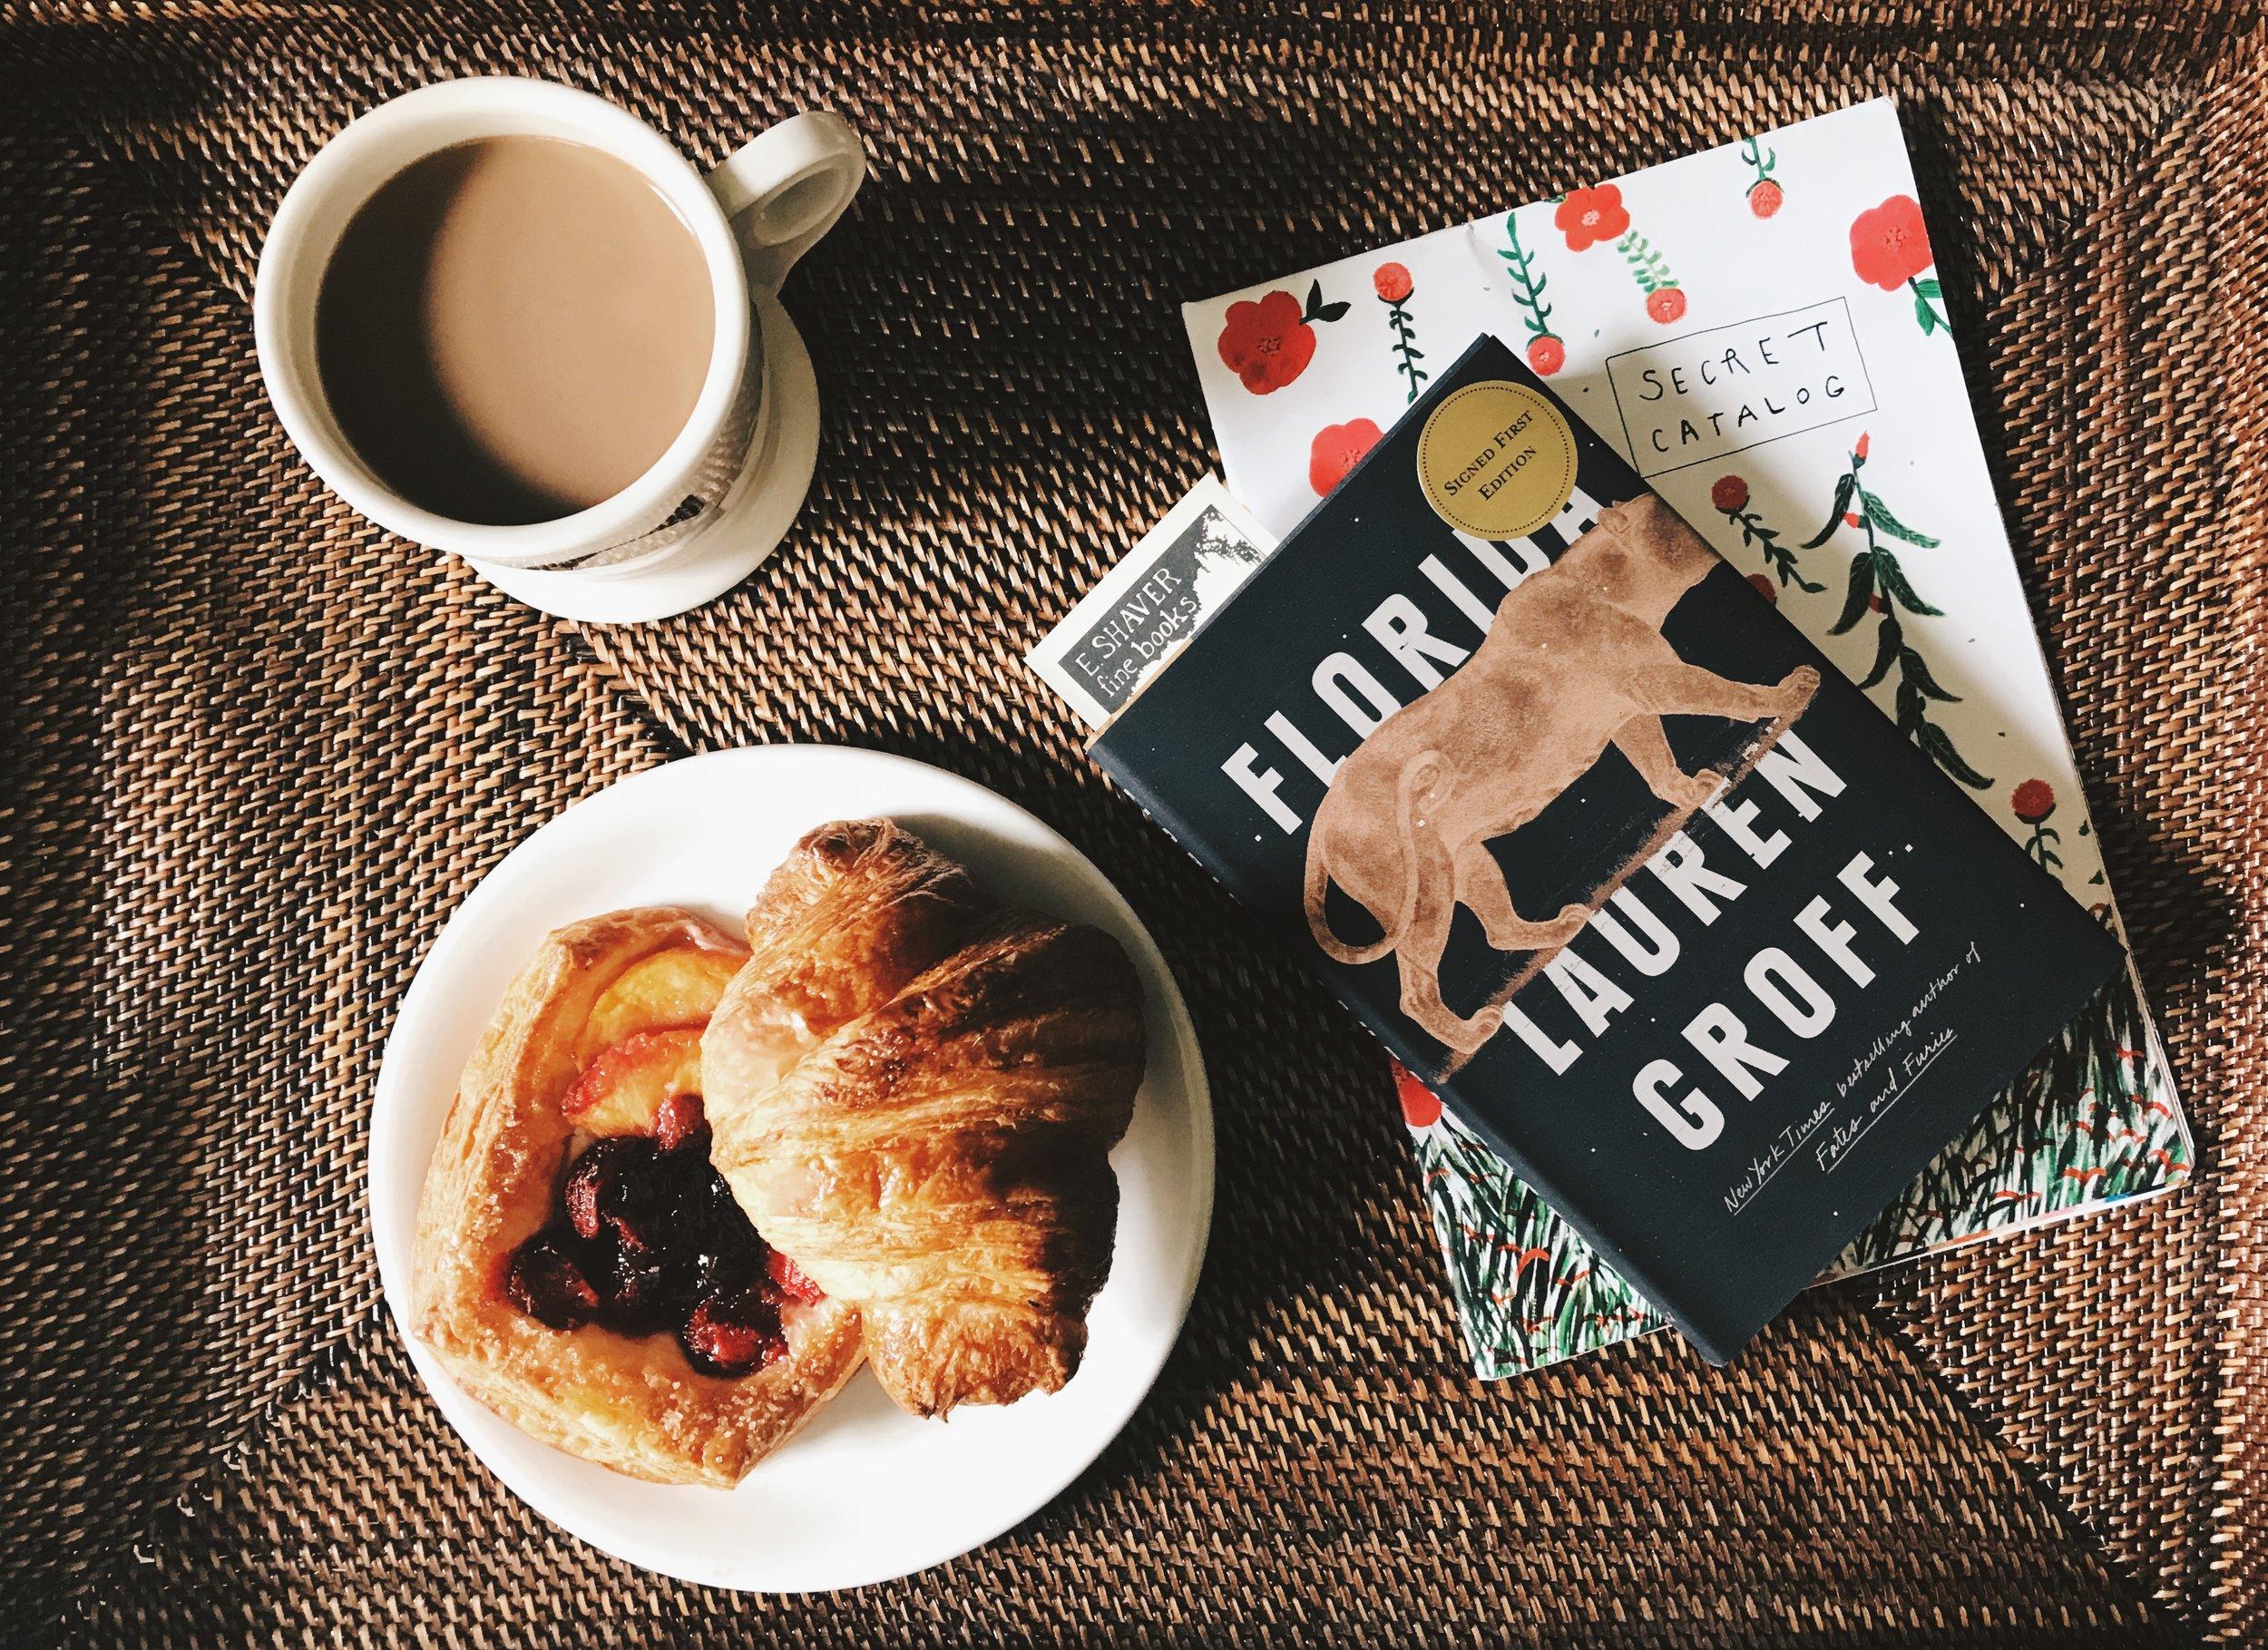 Breakfast Tray,   Williams-Sonoma   ( similar ). Mug,   Anthropologie  .   Florida   by Lauren Groff.